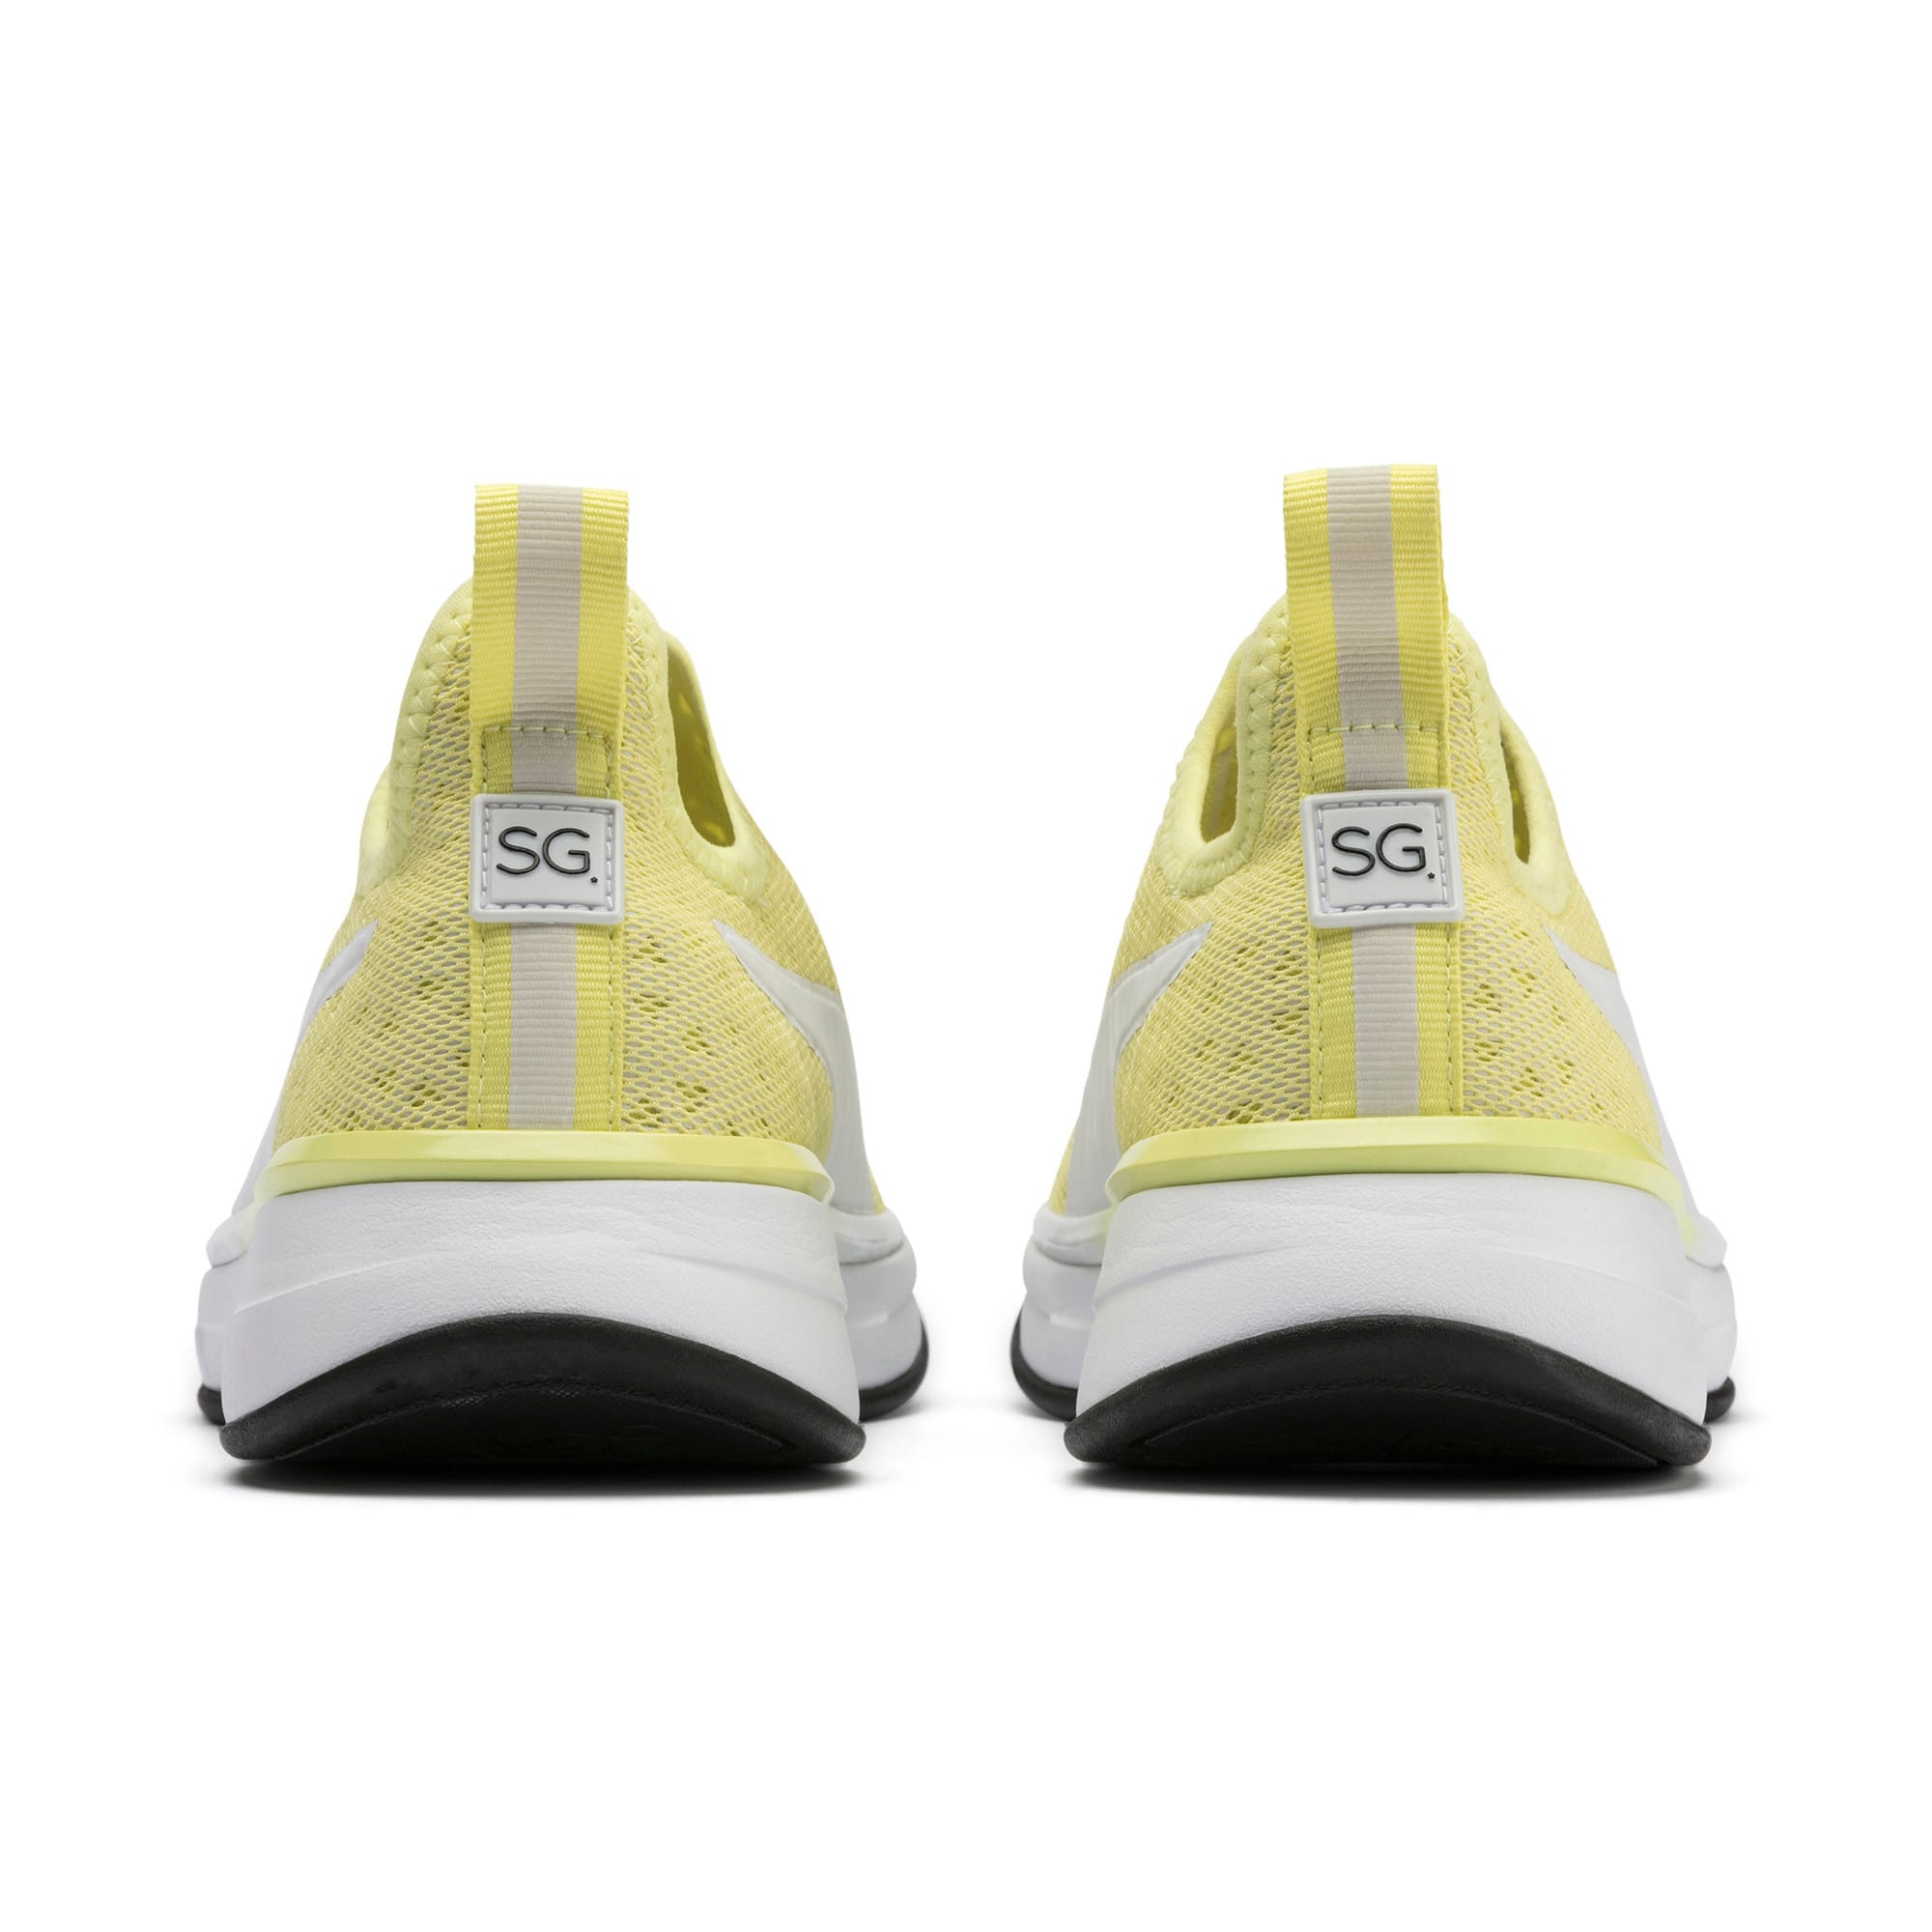 Thumbnail 4 of SG Slip-on Bright Women's Training Shoes, YELLOW-Puma White-Puma Black, medium